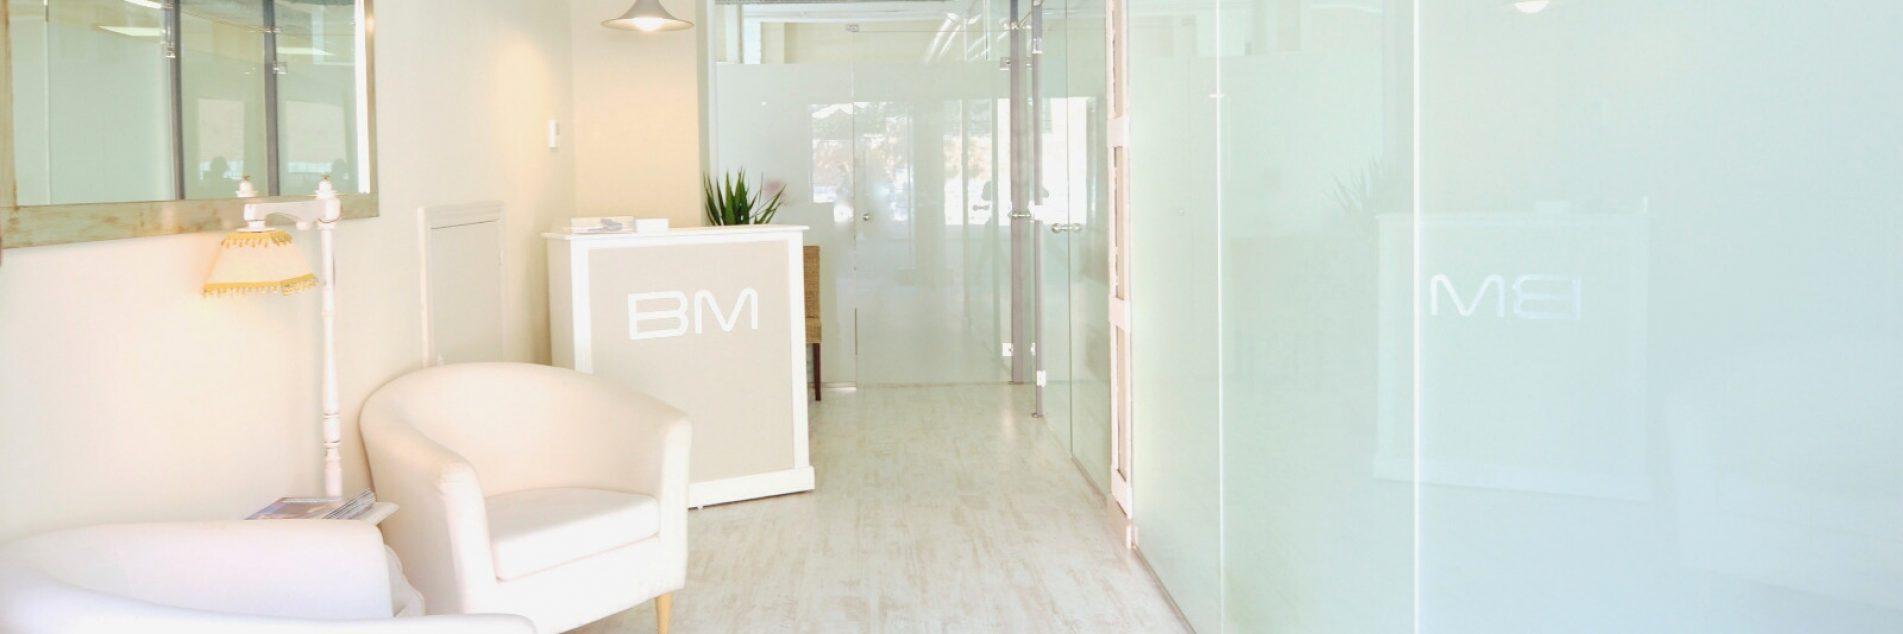 Fisioterapia BM